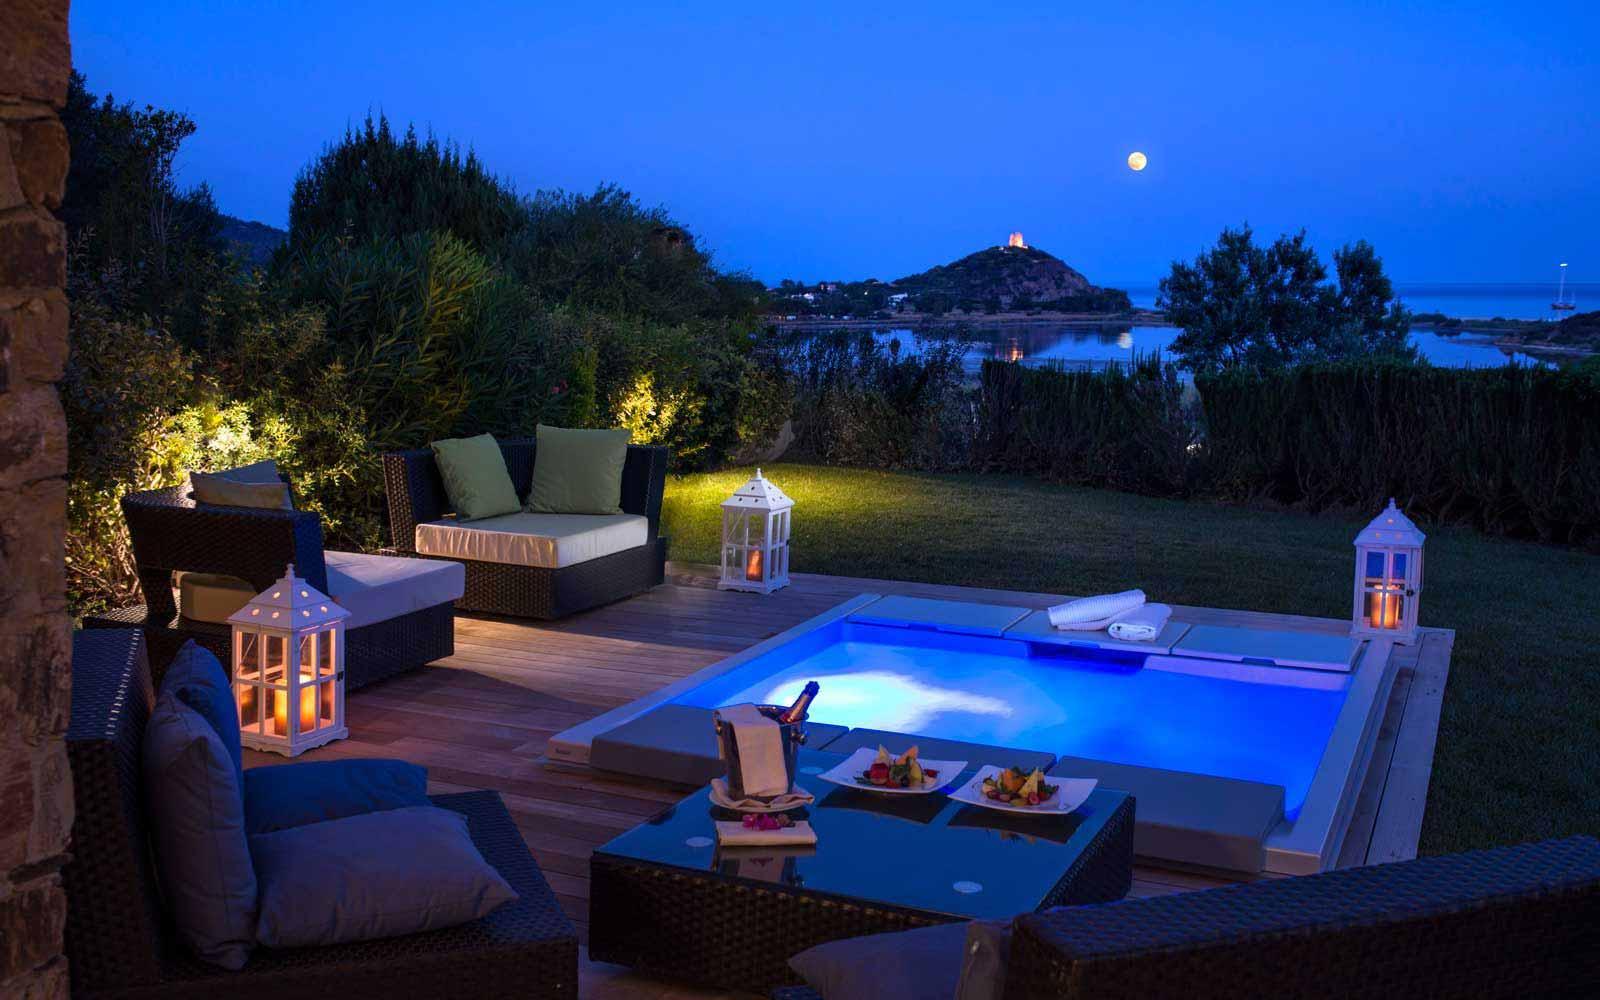 Hotel Laguna garden suite swimming pool at night